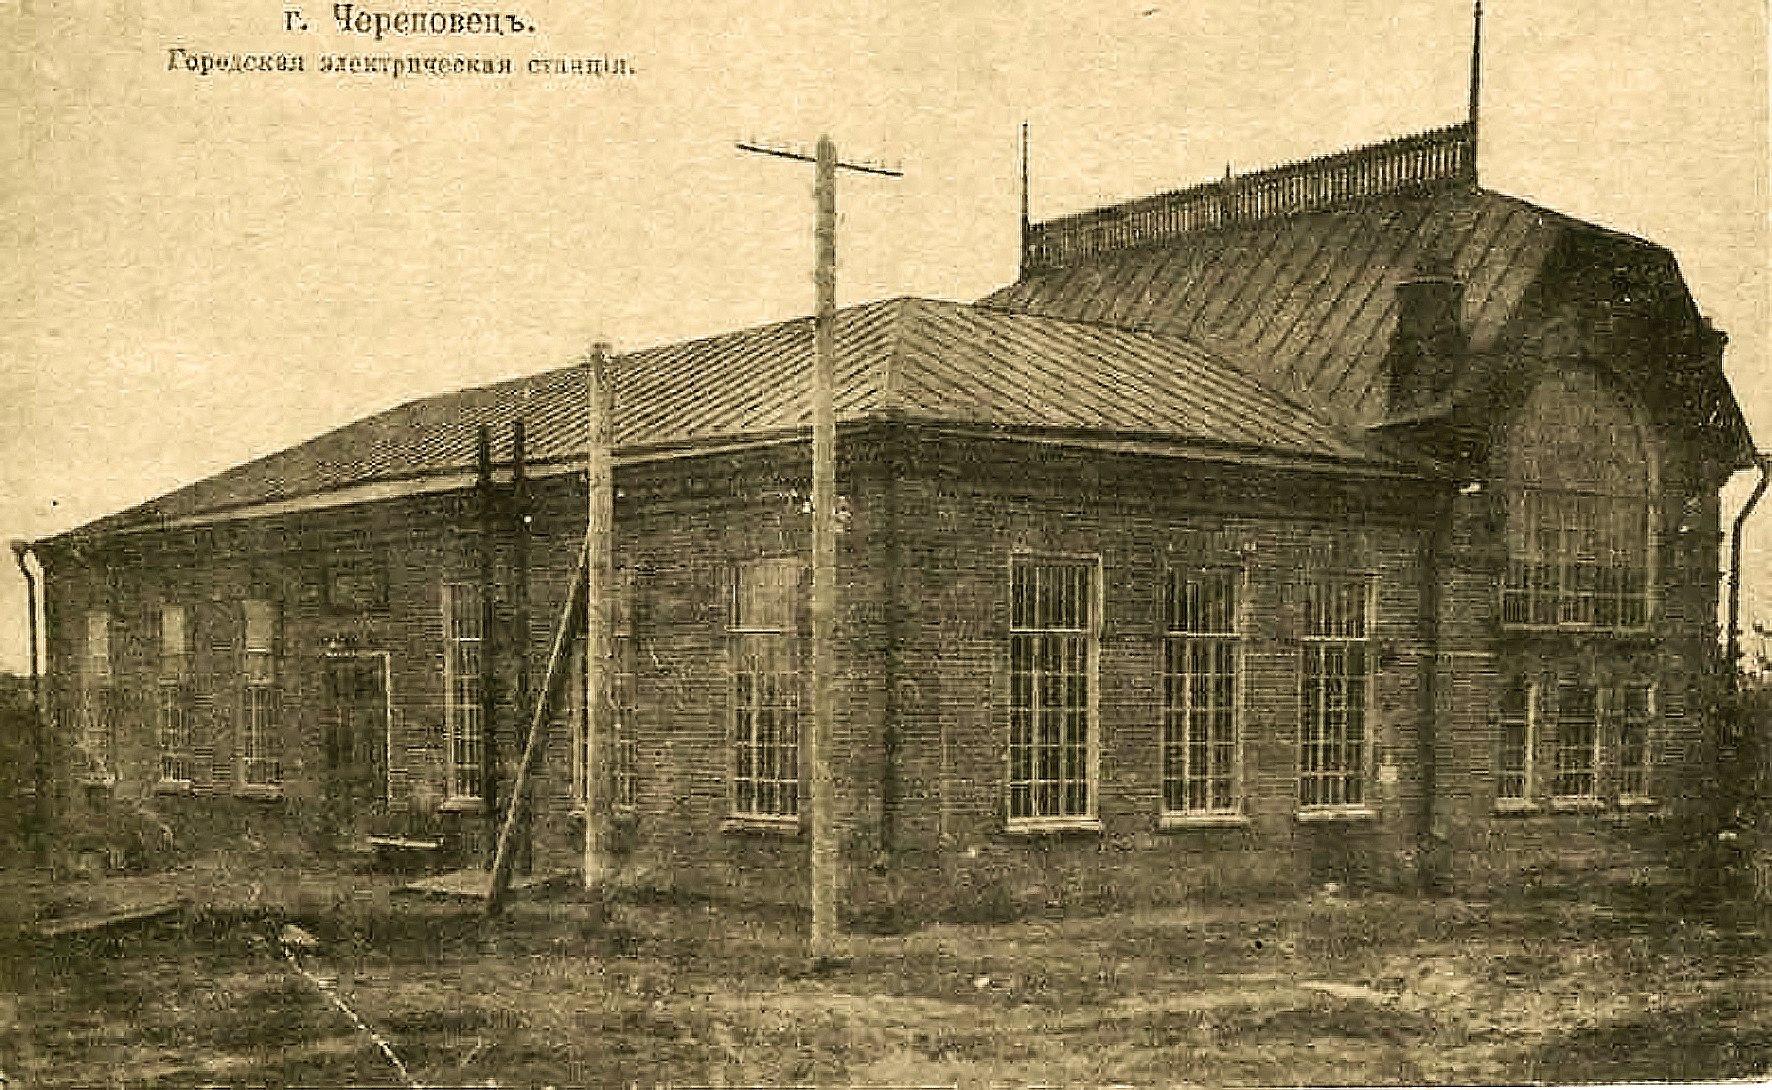 Городская электрическая станция